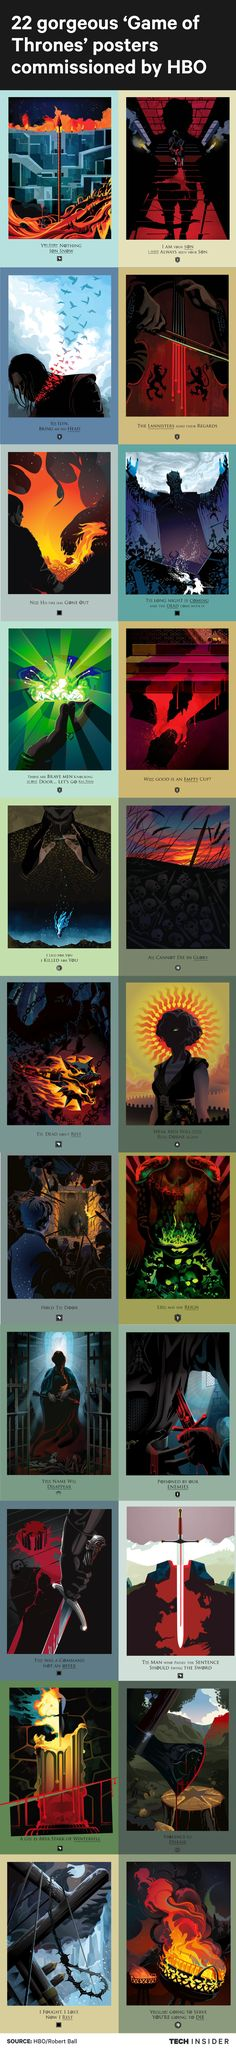 These gorgeous posters take four days to make.